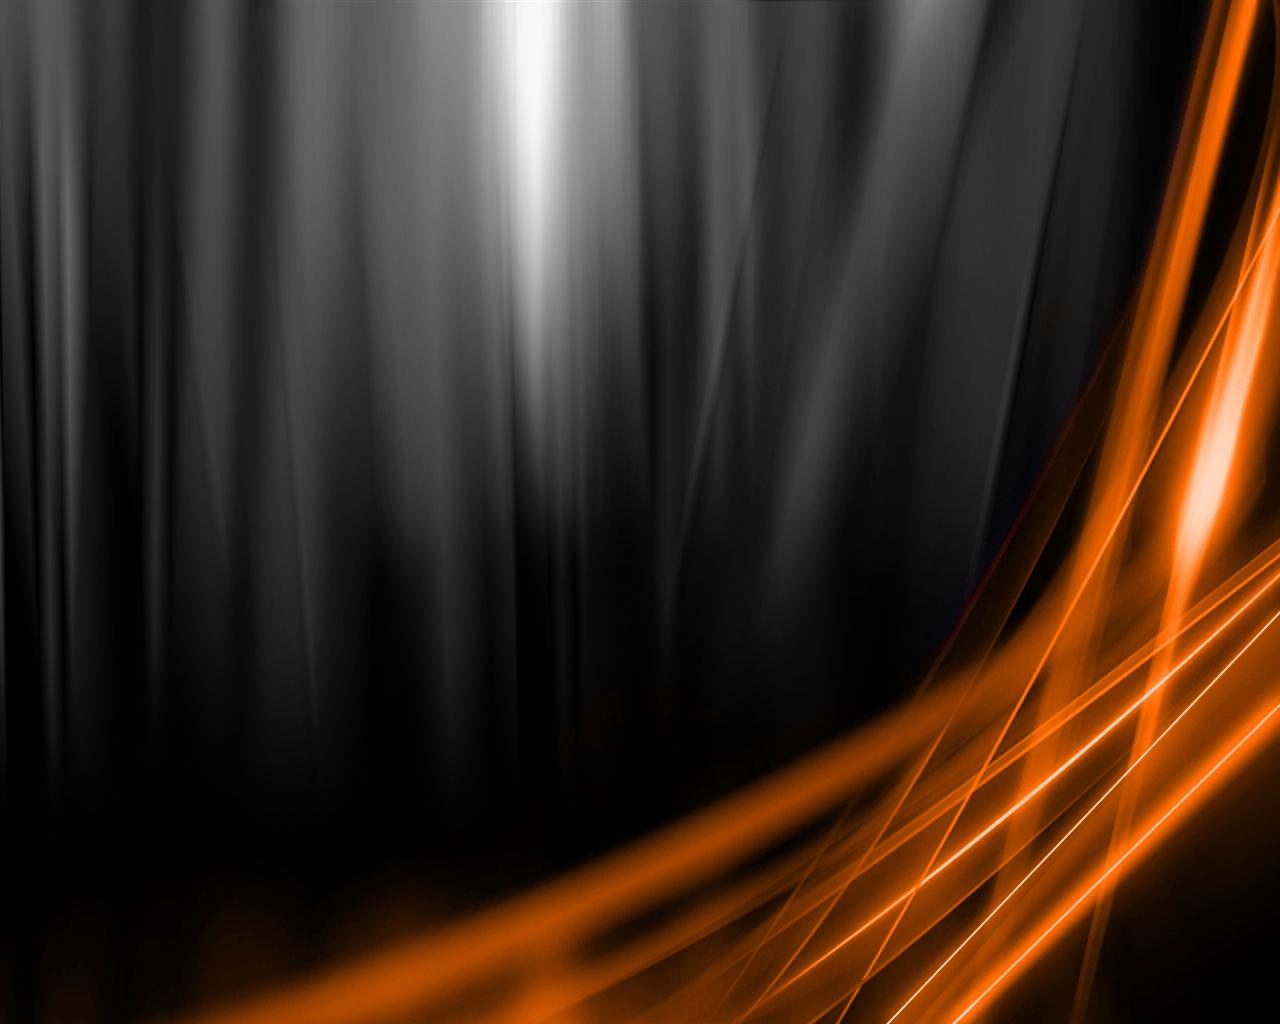 Index of wp contentuploadsblack and orange backgrounds black and orange bac voltagebd Image collections